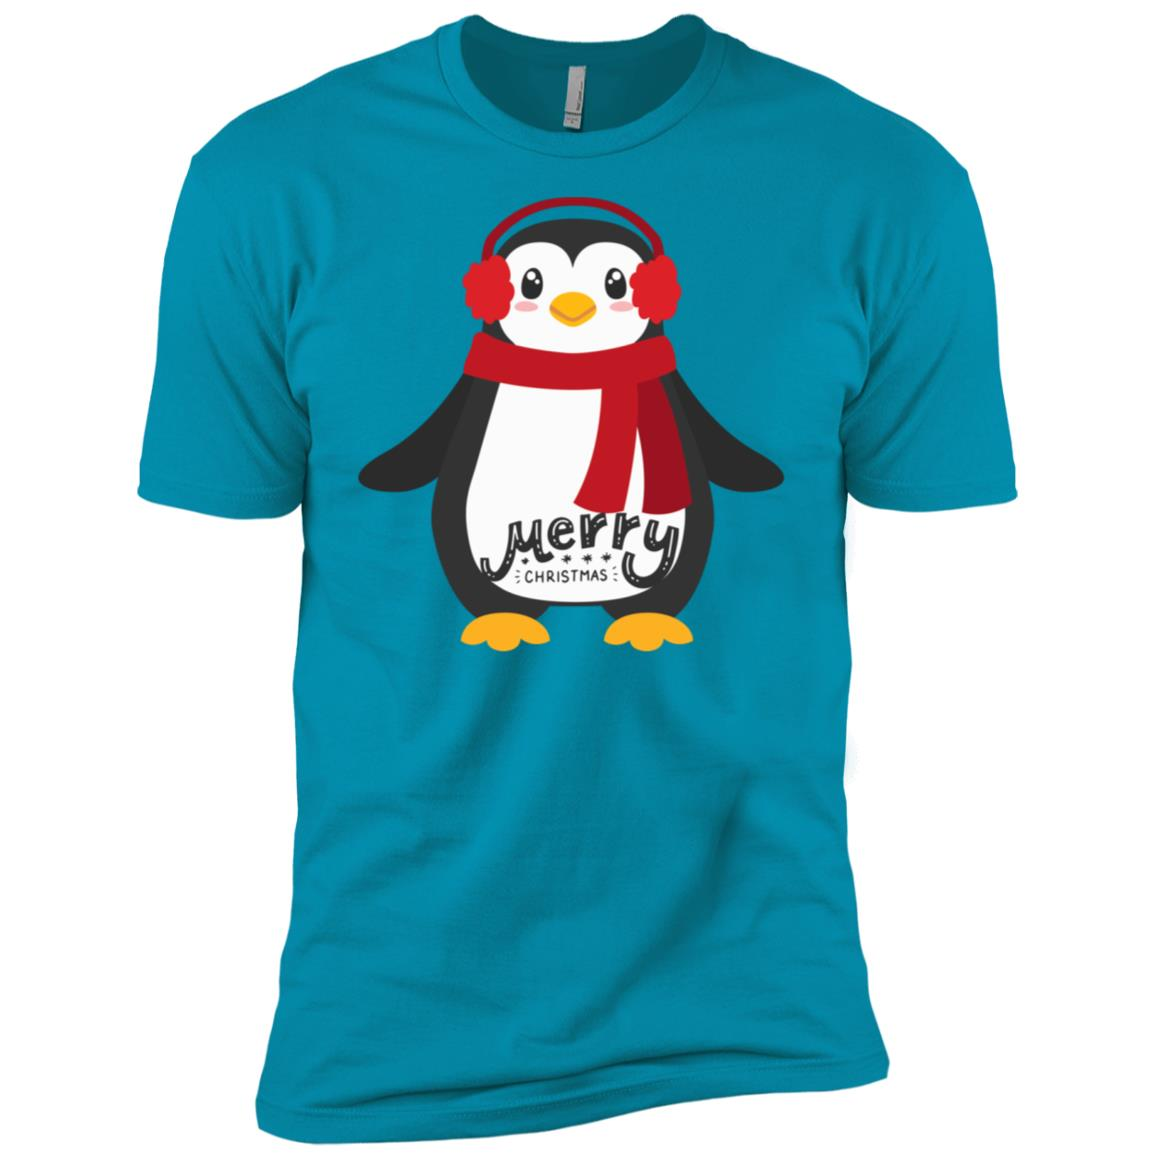 Cute Merry Christmas Baby Penguin Tee-1 Men Short Sleeve T-Shirt